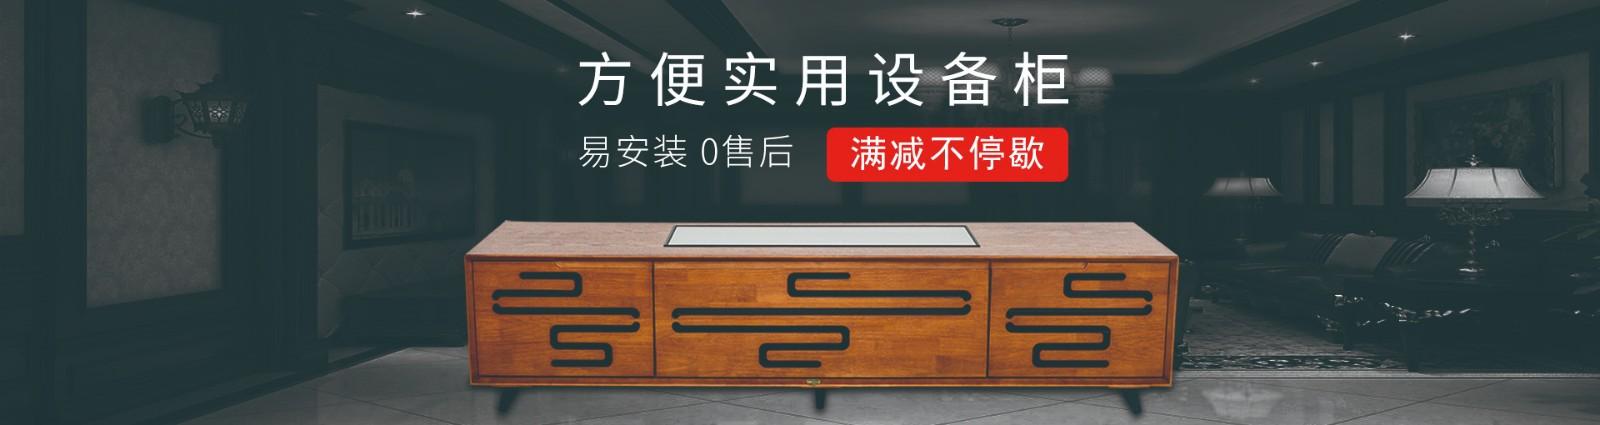 E-JOIN猛犸客厅机柜E83-Y2000W-G02投影仪内置激光电视柜影音设备柜橡胶木可定制 香槟金 2000*470*560mm